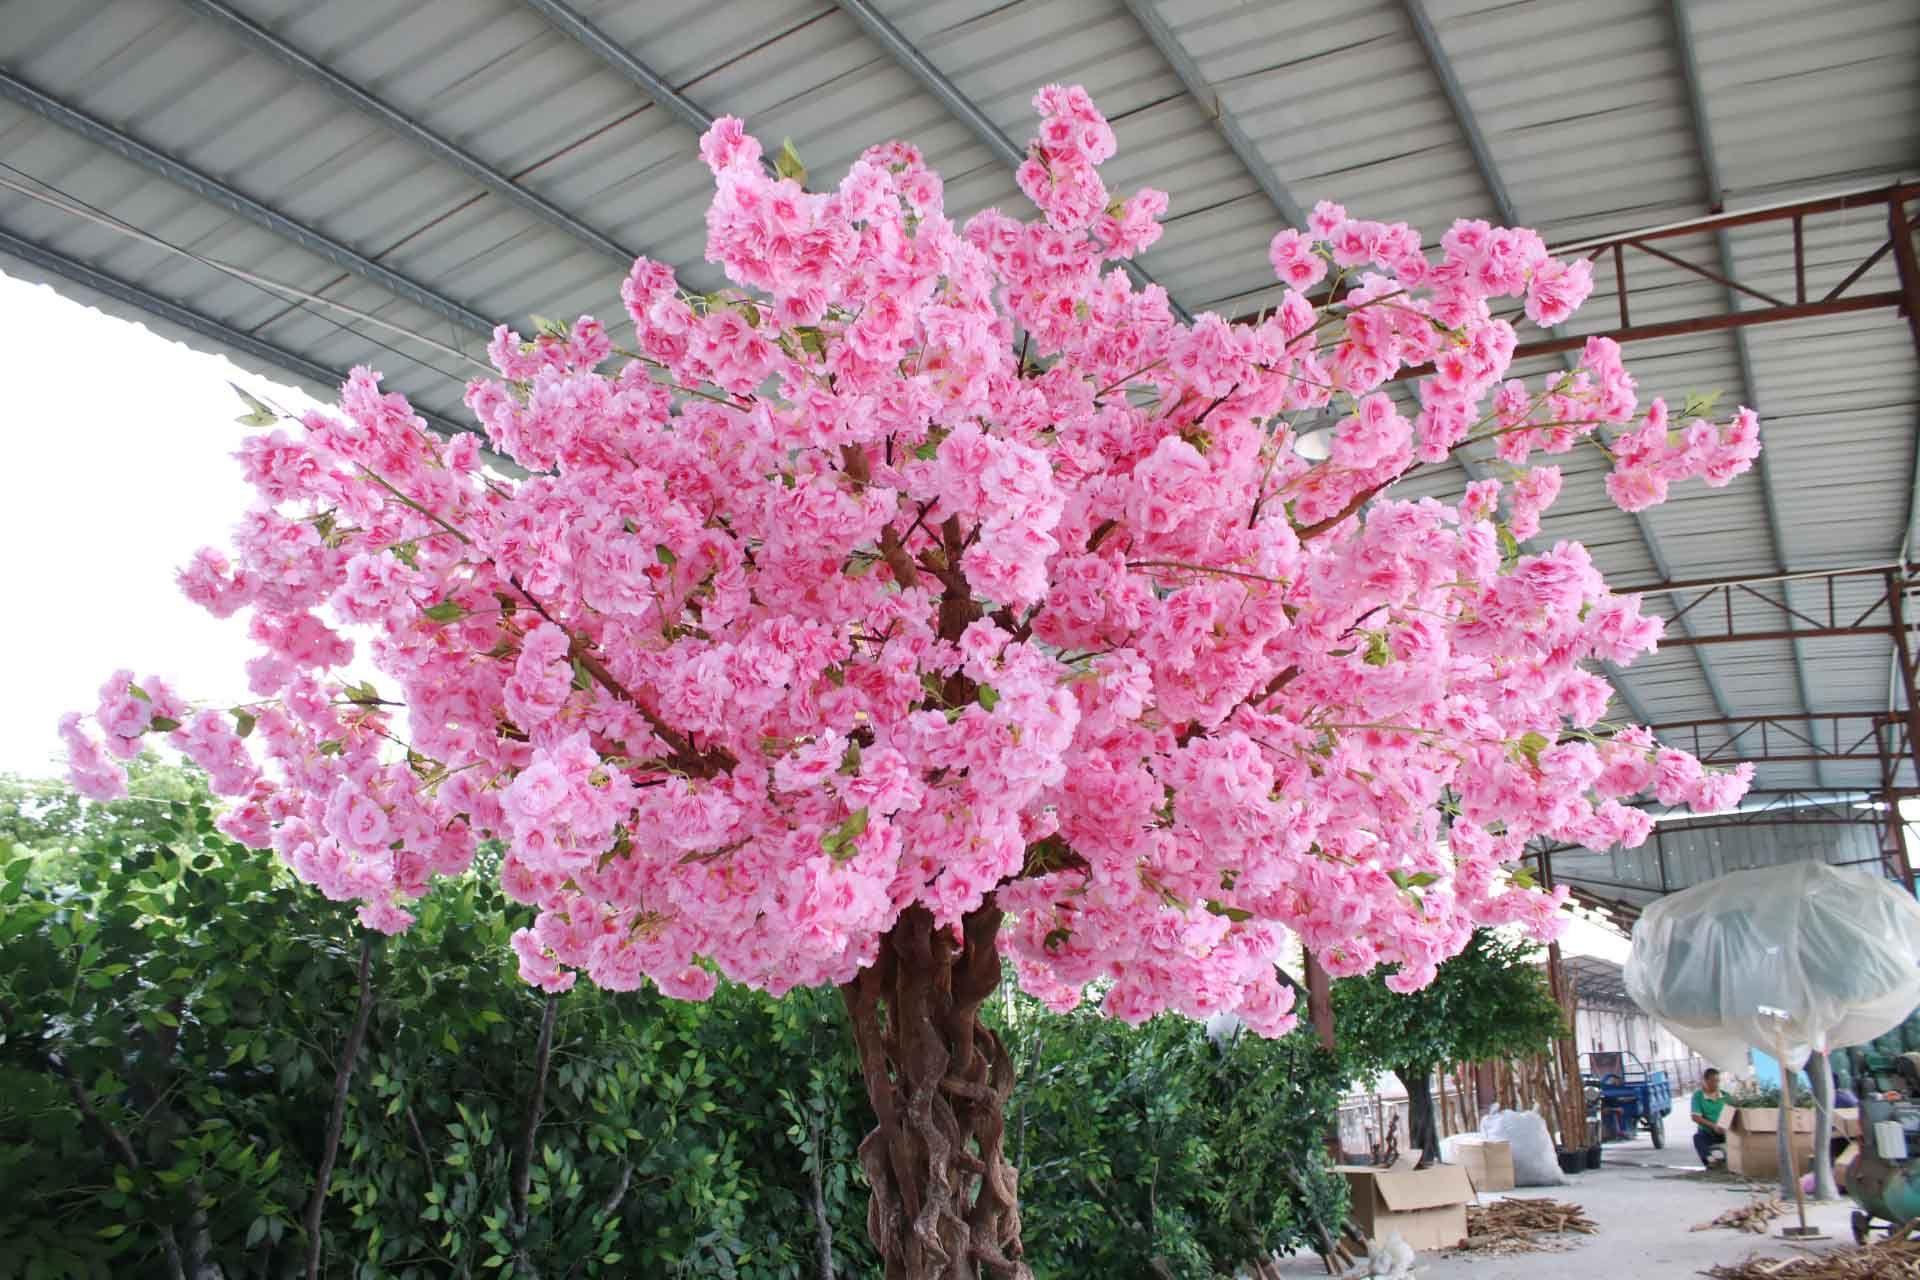 Source Newest Artificial Sakura Flower Tree Japanese Cherry Blossom Tree For Wedding Decoration On M A Blossom Tree Wedding Flowering Trees Cherry Blossom Tree